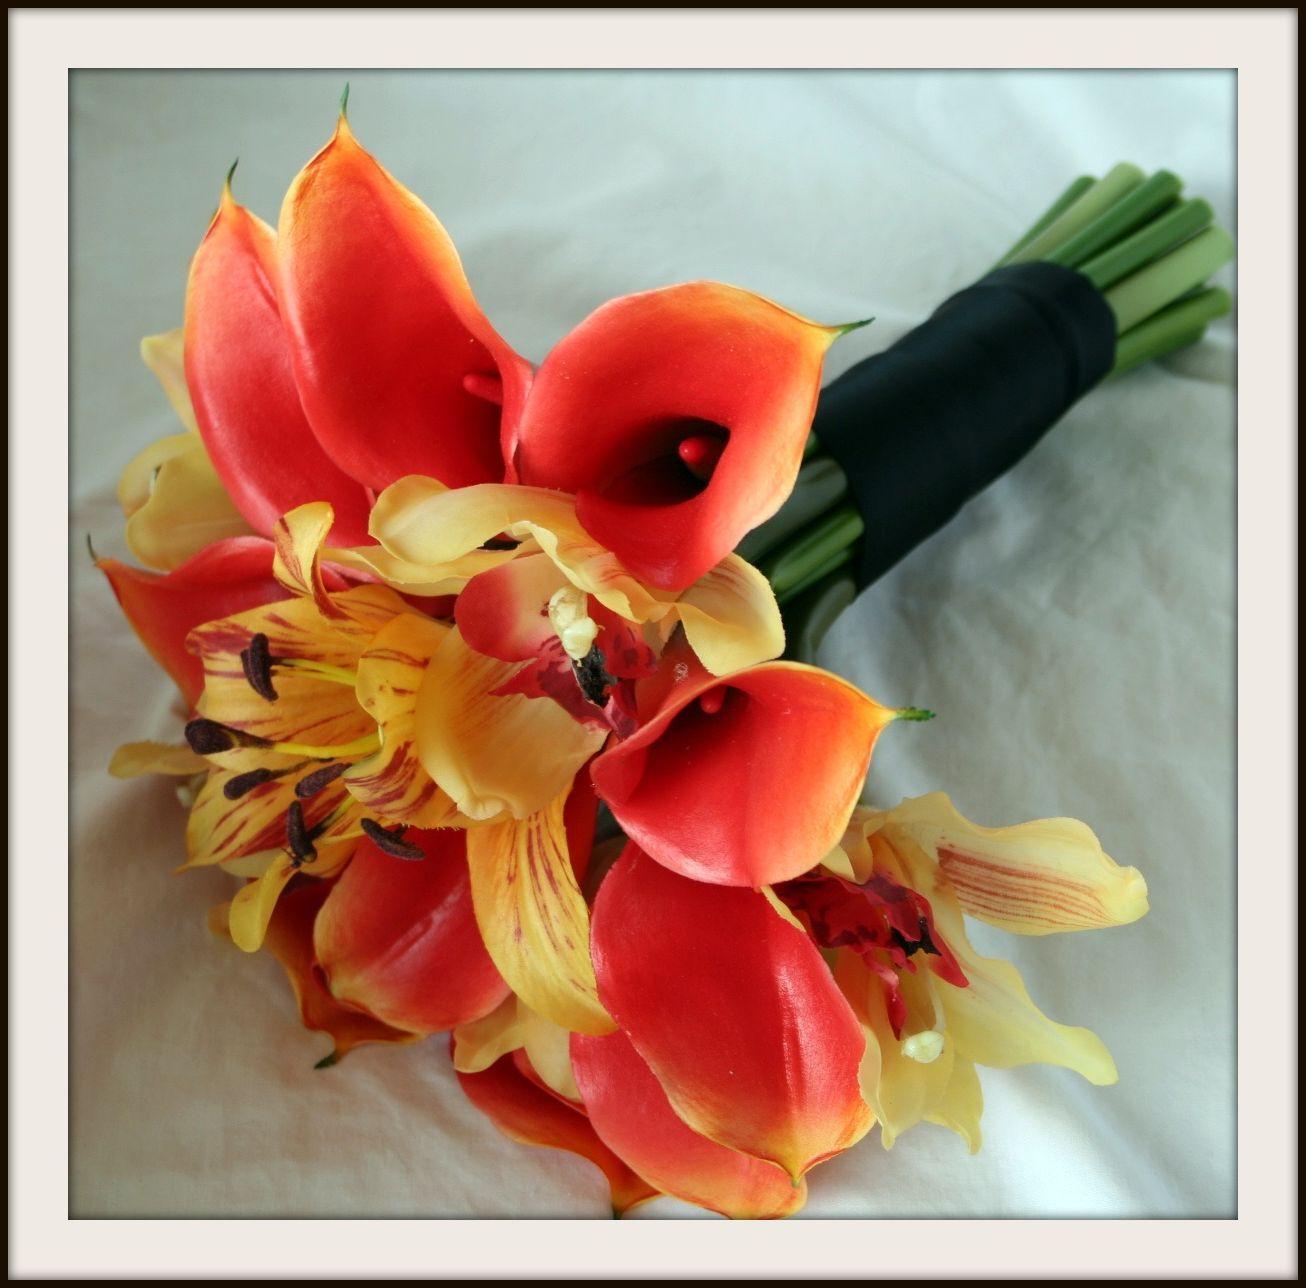 Flowers & Decor, yellow, orange, Bride Bouquets, Bride, Flowers, Bouquet, Calla, Lilies, Orchids, Lily, Cymbidium, Natural, Mango, Touch, Shavons wedding silks, Oriental